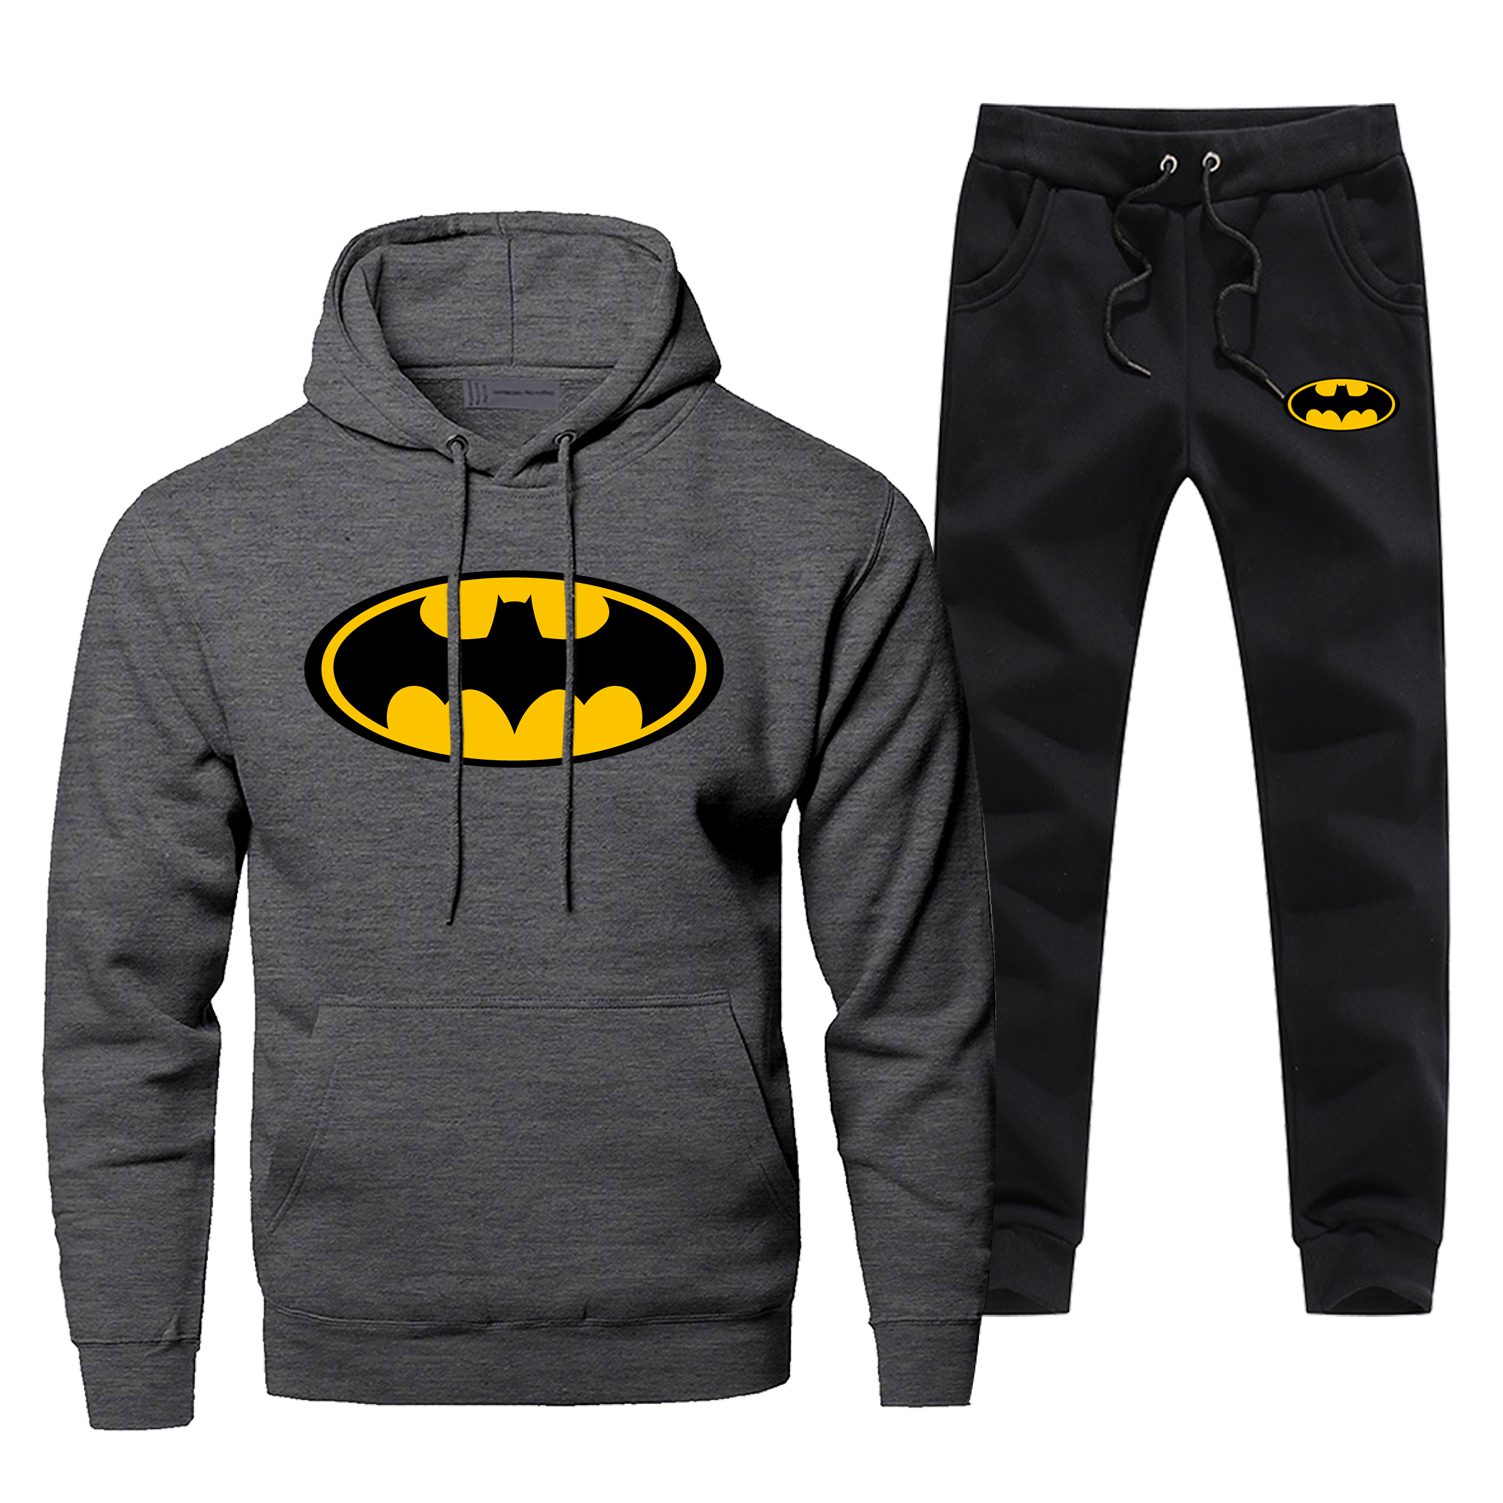 Fashion Marvel Superhero Batman LOGO Print Hoodies+pants Men Sets Casual Super Hero Sweatshirt Tracksuit Fleece Mens Sportswear